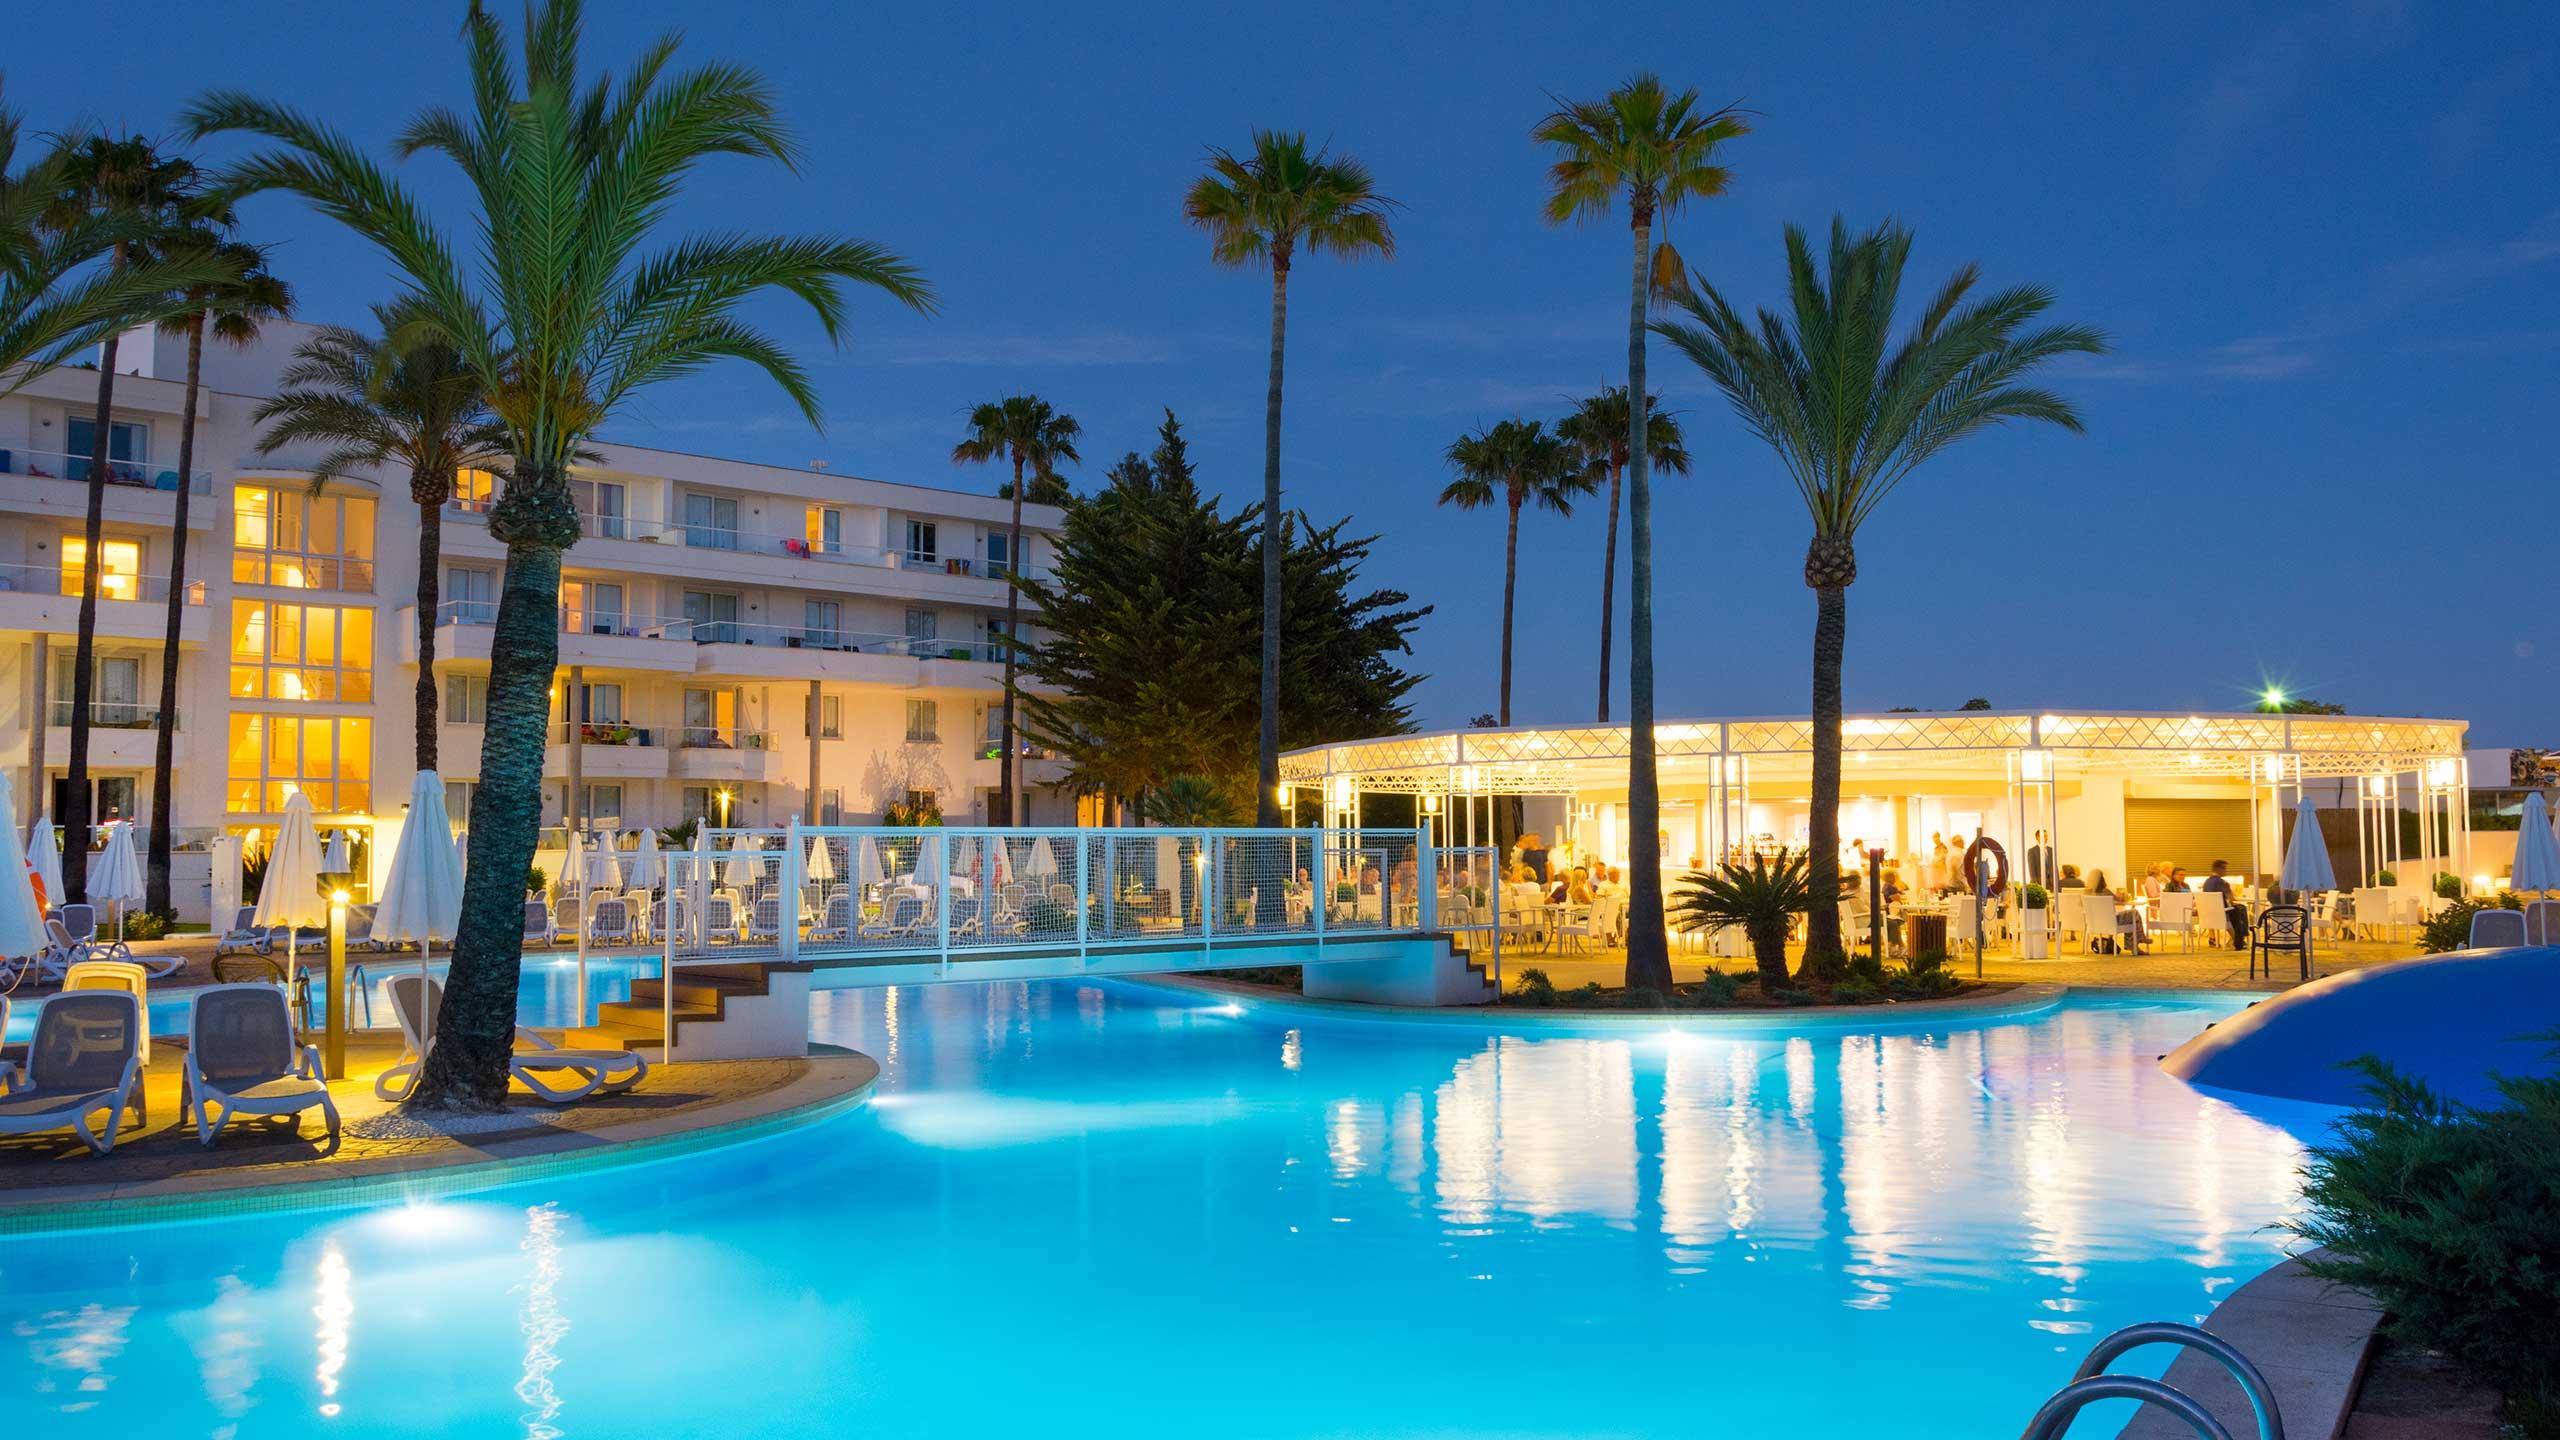 Bien-aimé Protur Vista Badia Aparthotel in Sa Coma, Majorca - Protur Hotels QM81